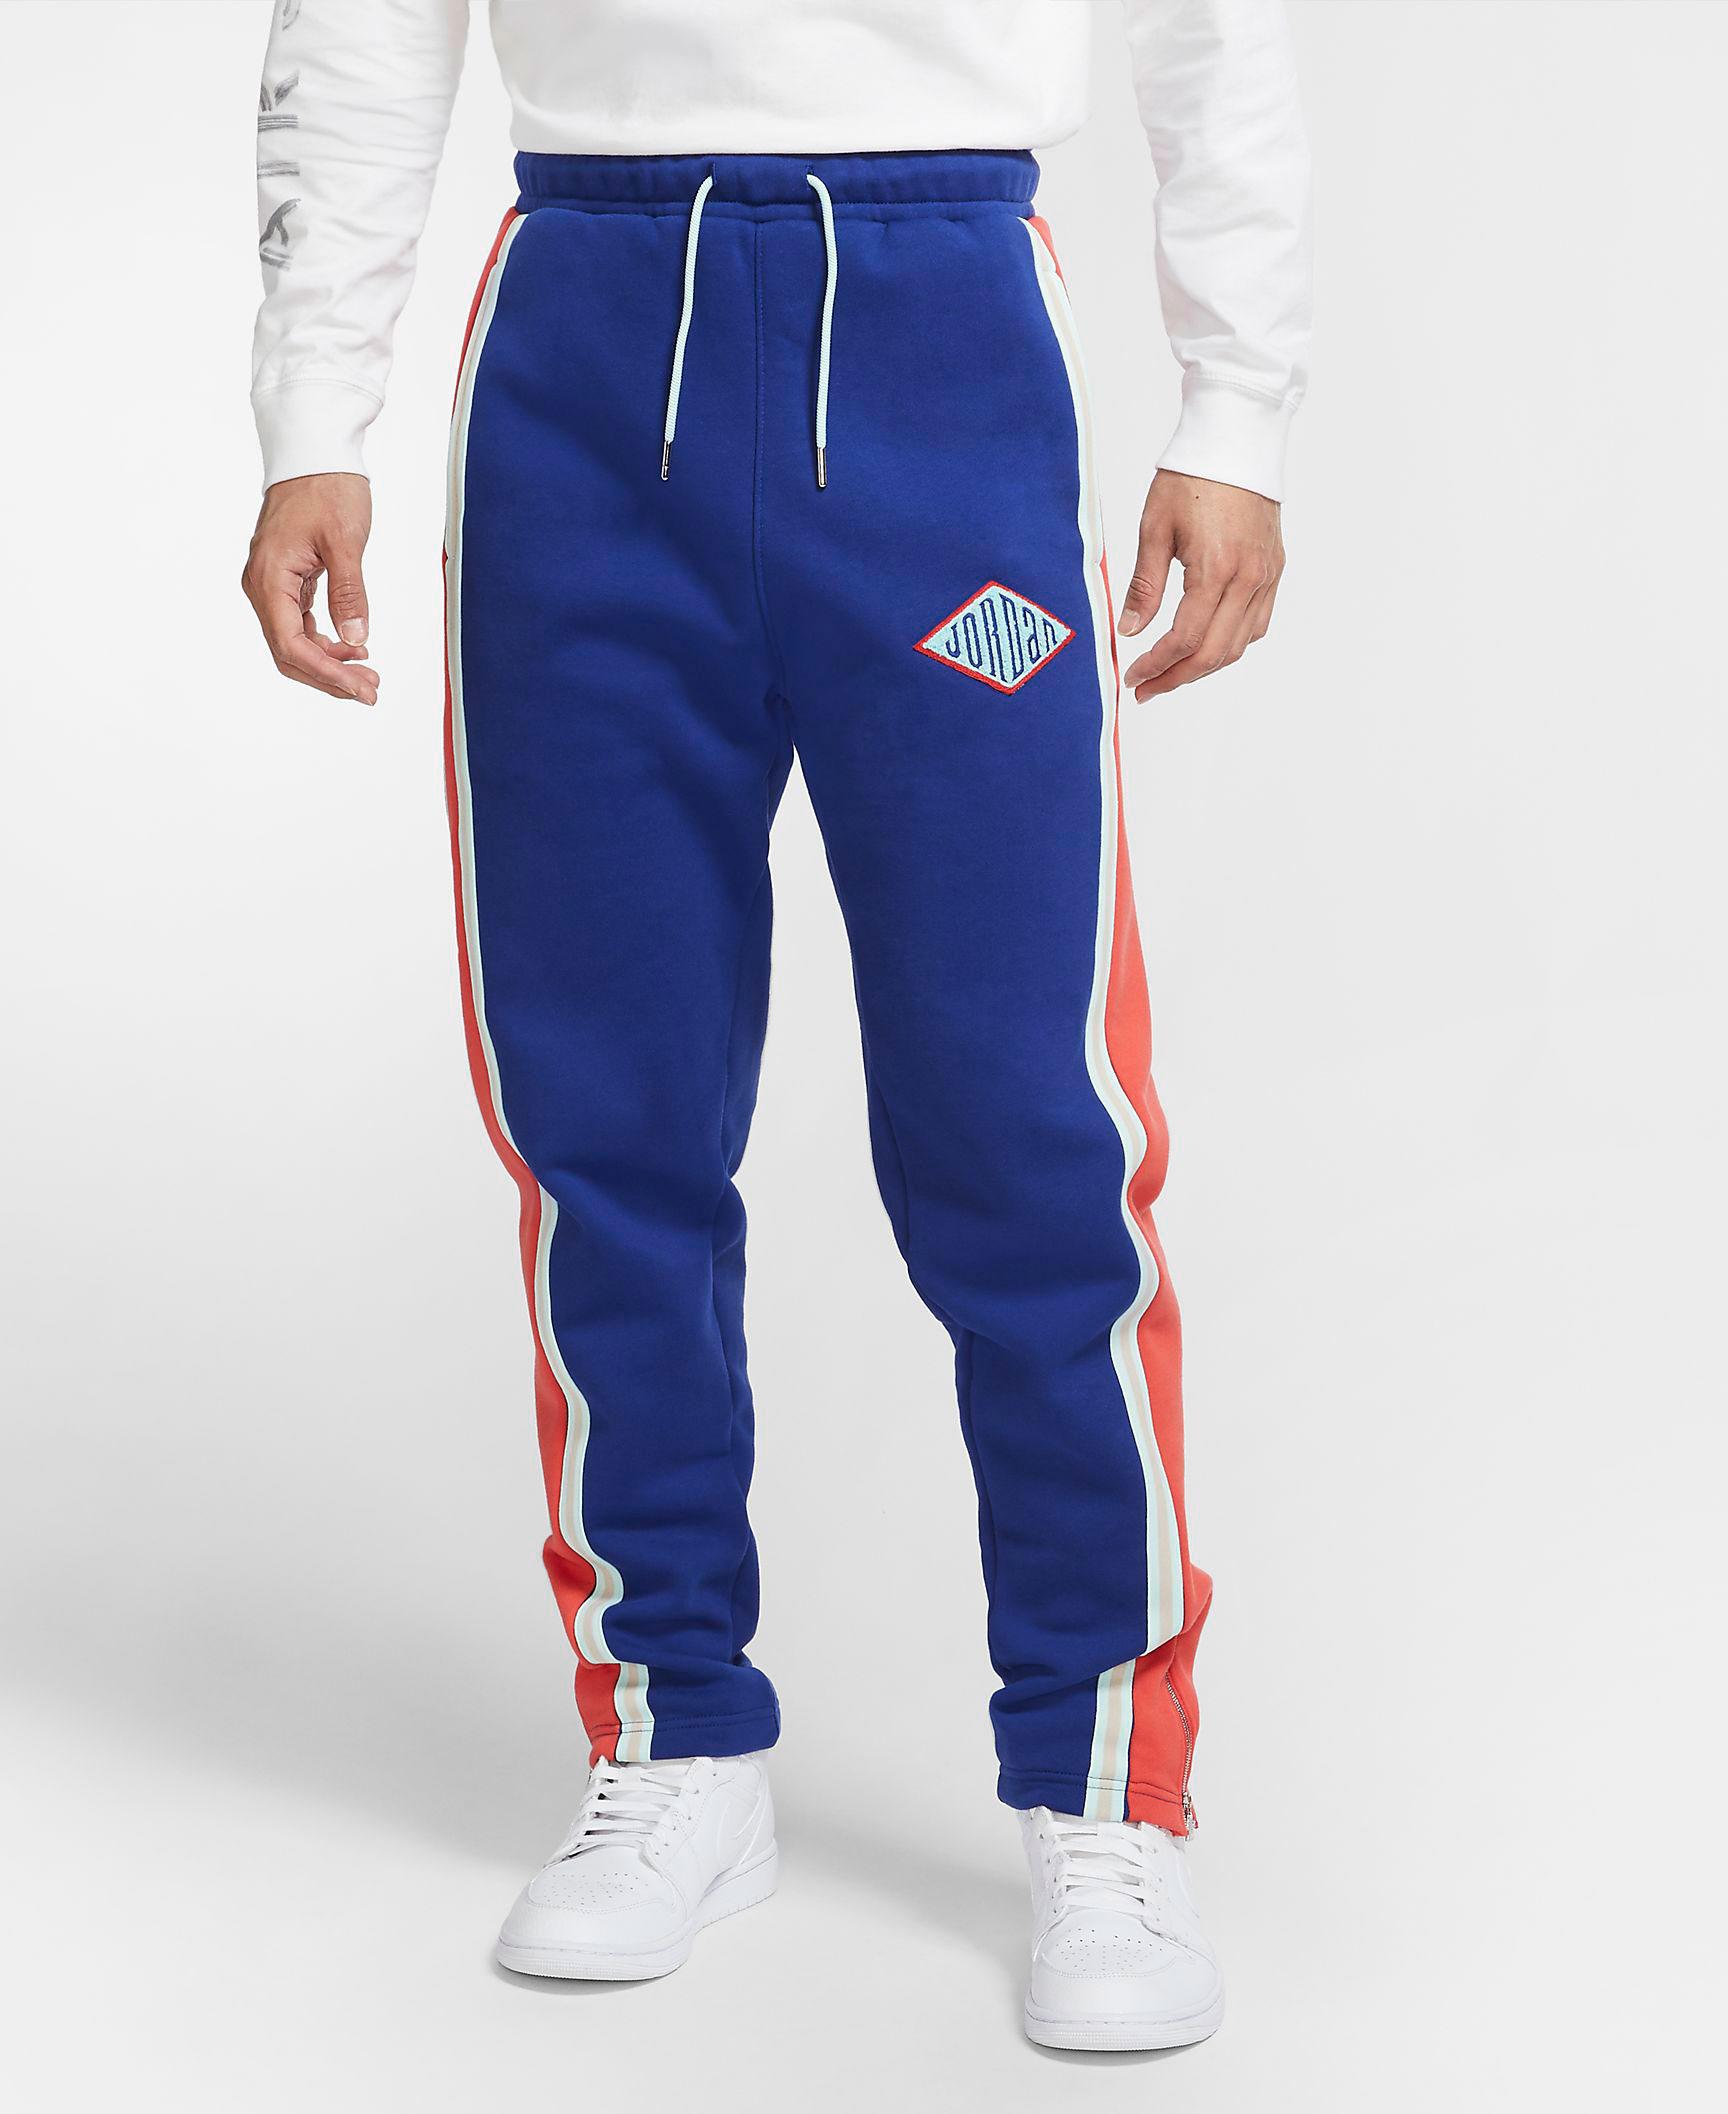 jordan-sport-dna-pants-blue-infrared